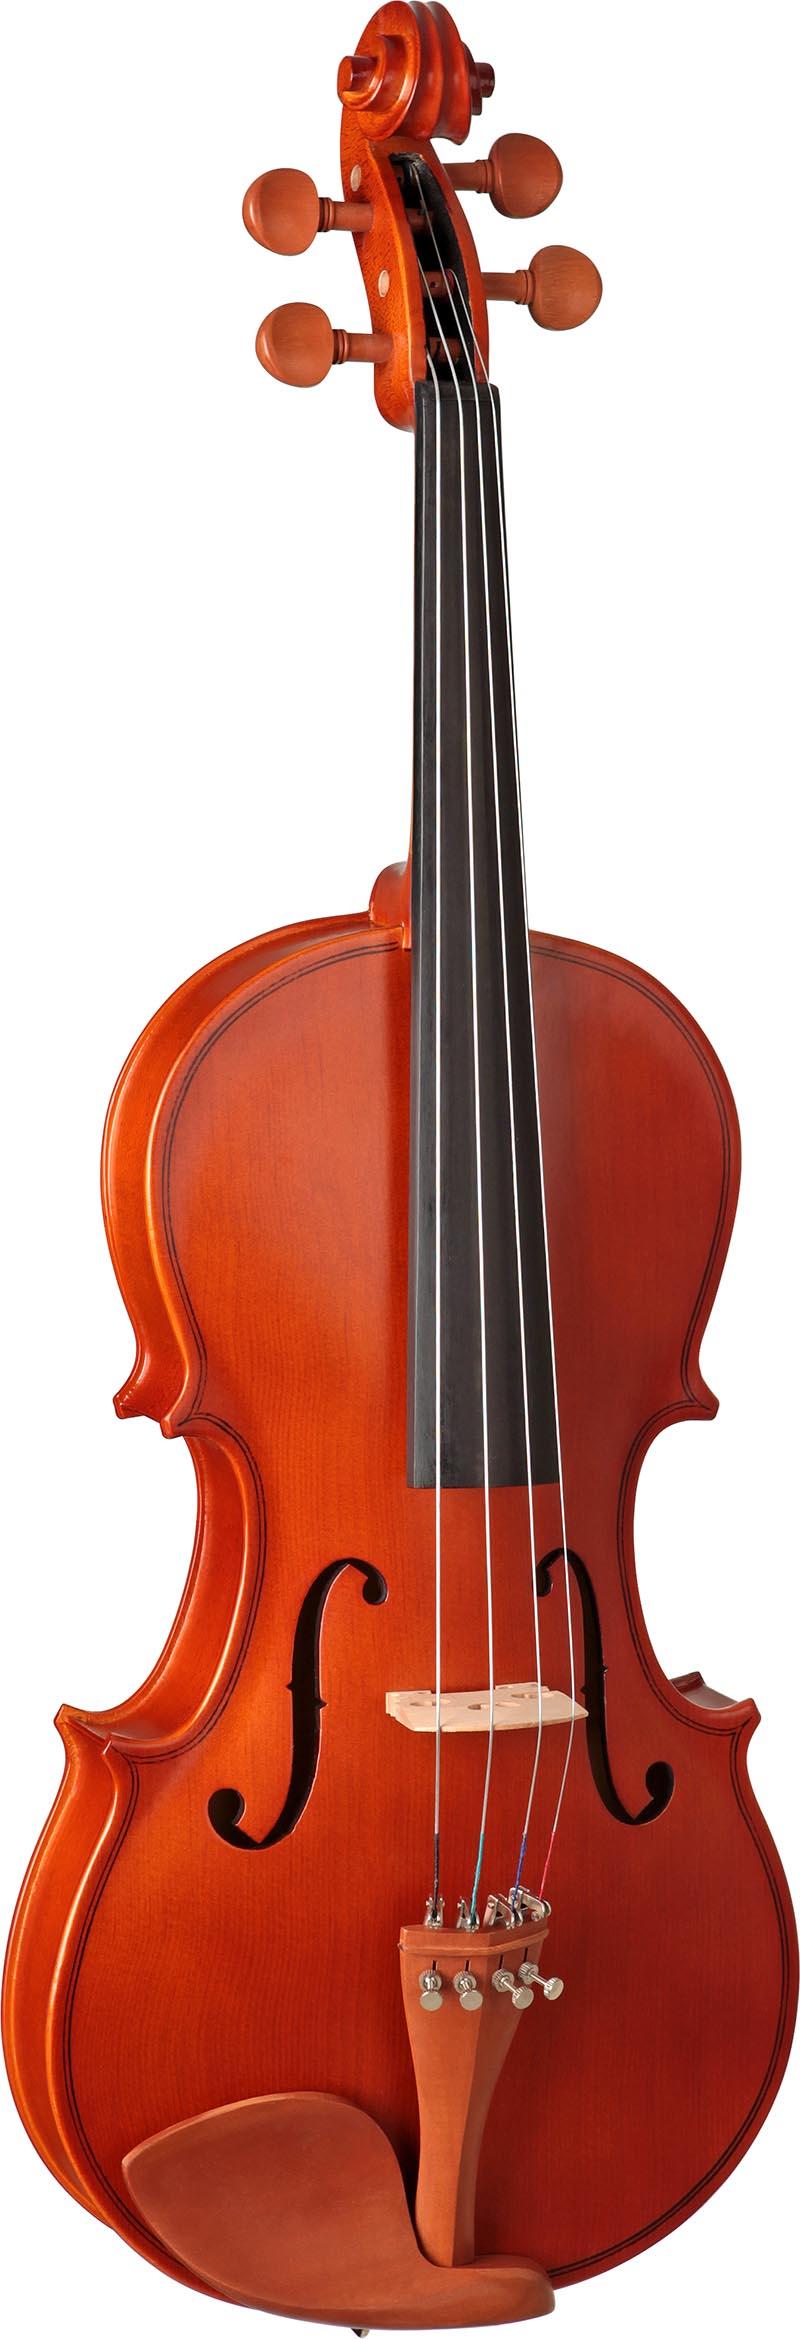 hva120 viola hofma hva120 visao frontal vertical